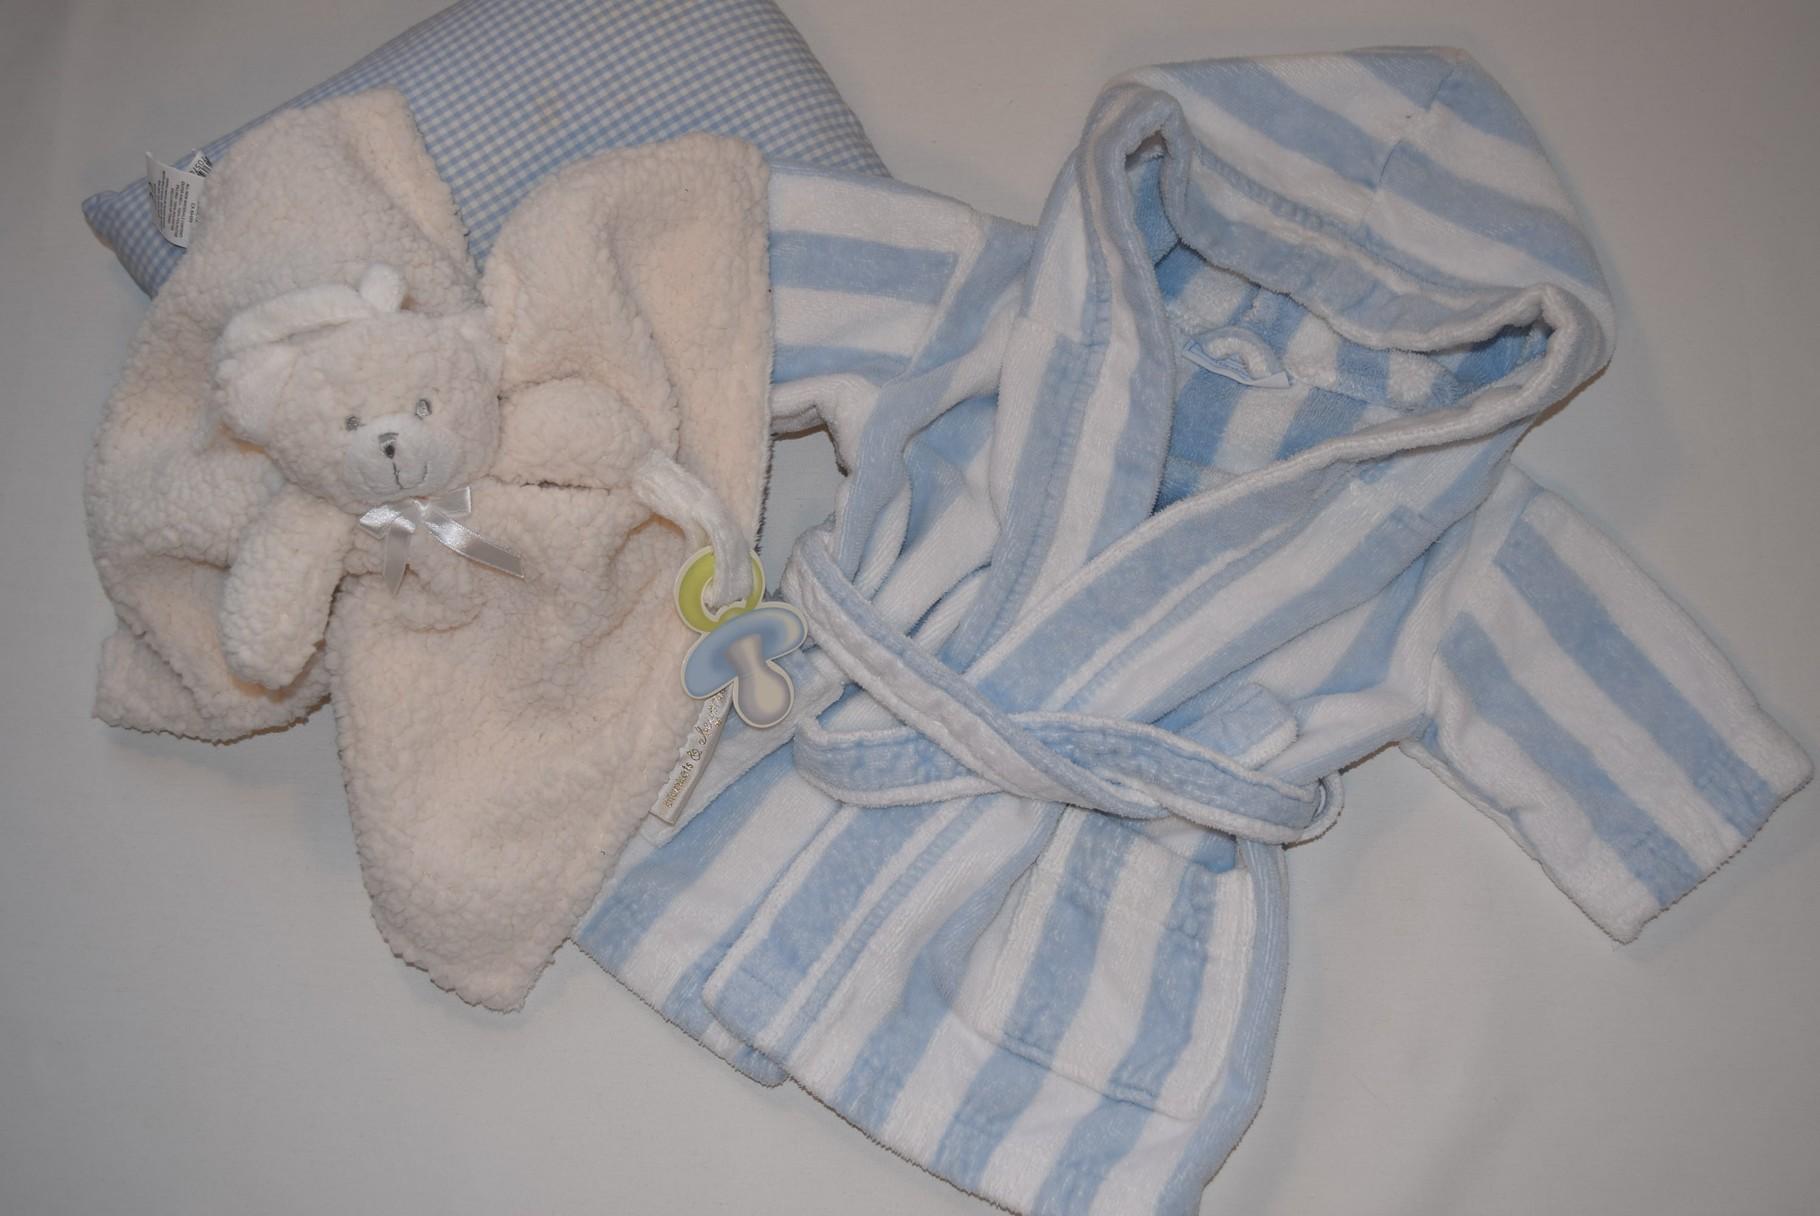 secondhand kids clothes Ireland Mycherishedkidsclothes